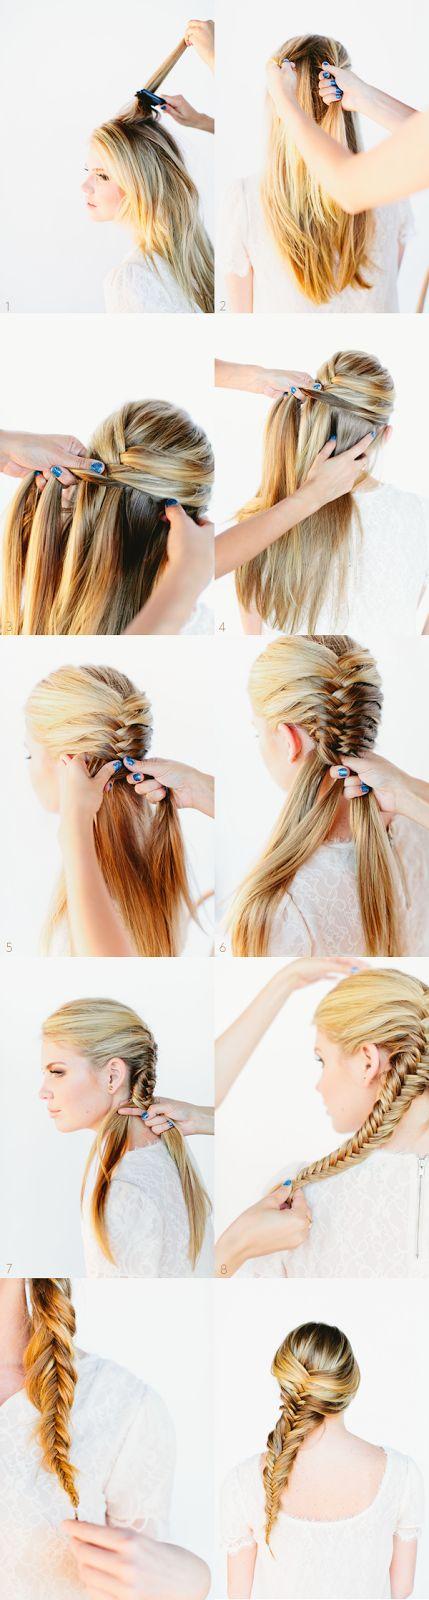 Amazing 1000 Ideas About Braided Hair Tutorials On Pinterest Hair Short Hairstyles For Black Women Fulllsitofus